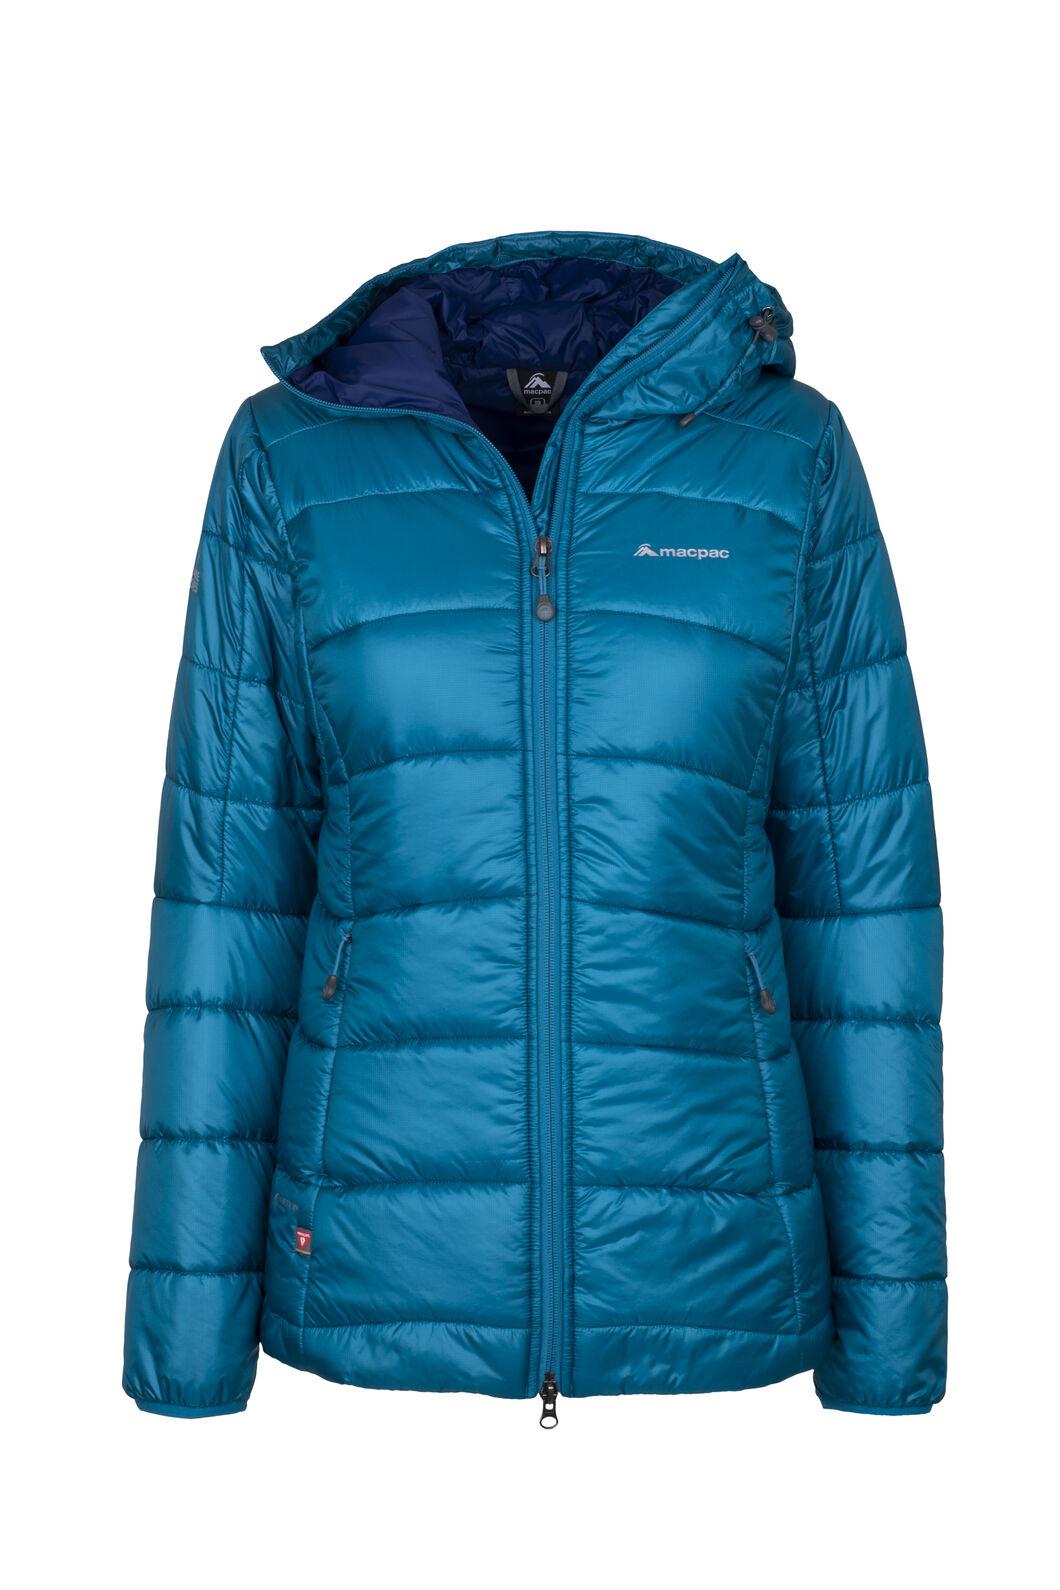 Macpac Pulsar Plus PrimaLoft® Hooded Jacket - Women's, Ocean Depths, hi-res